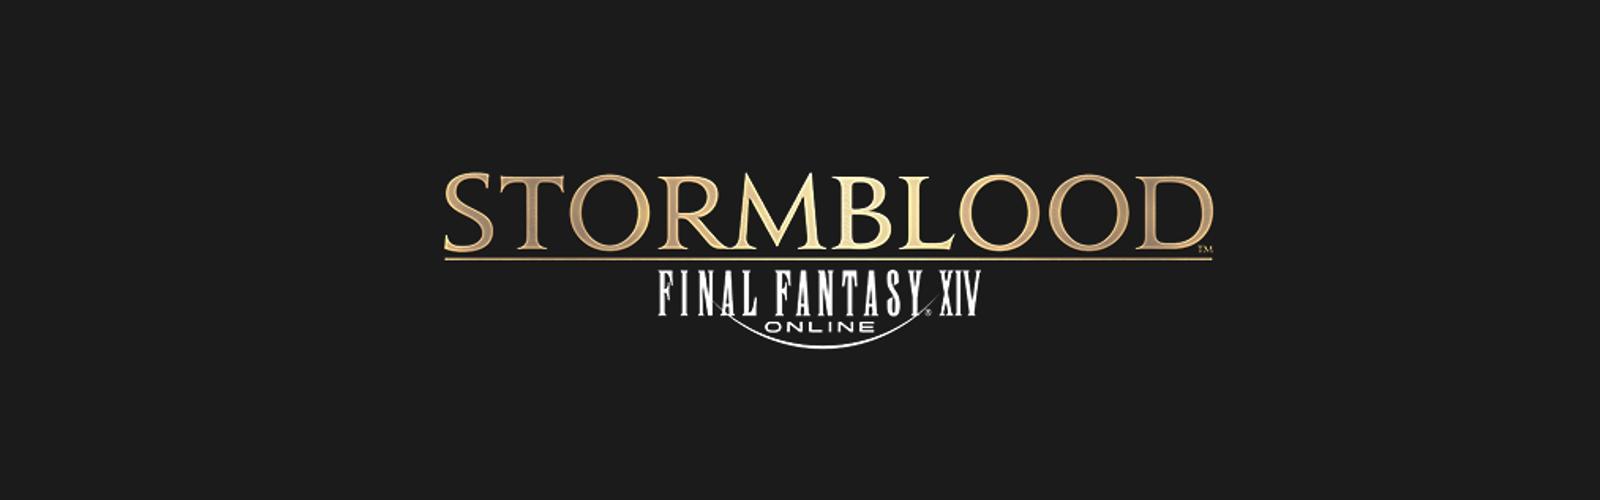 Mog Station Login >> FINAL FANTASY XIV: Stormblood Early Access Details – Final Fantasy XIV